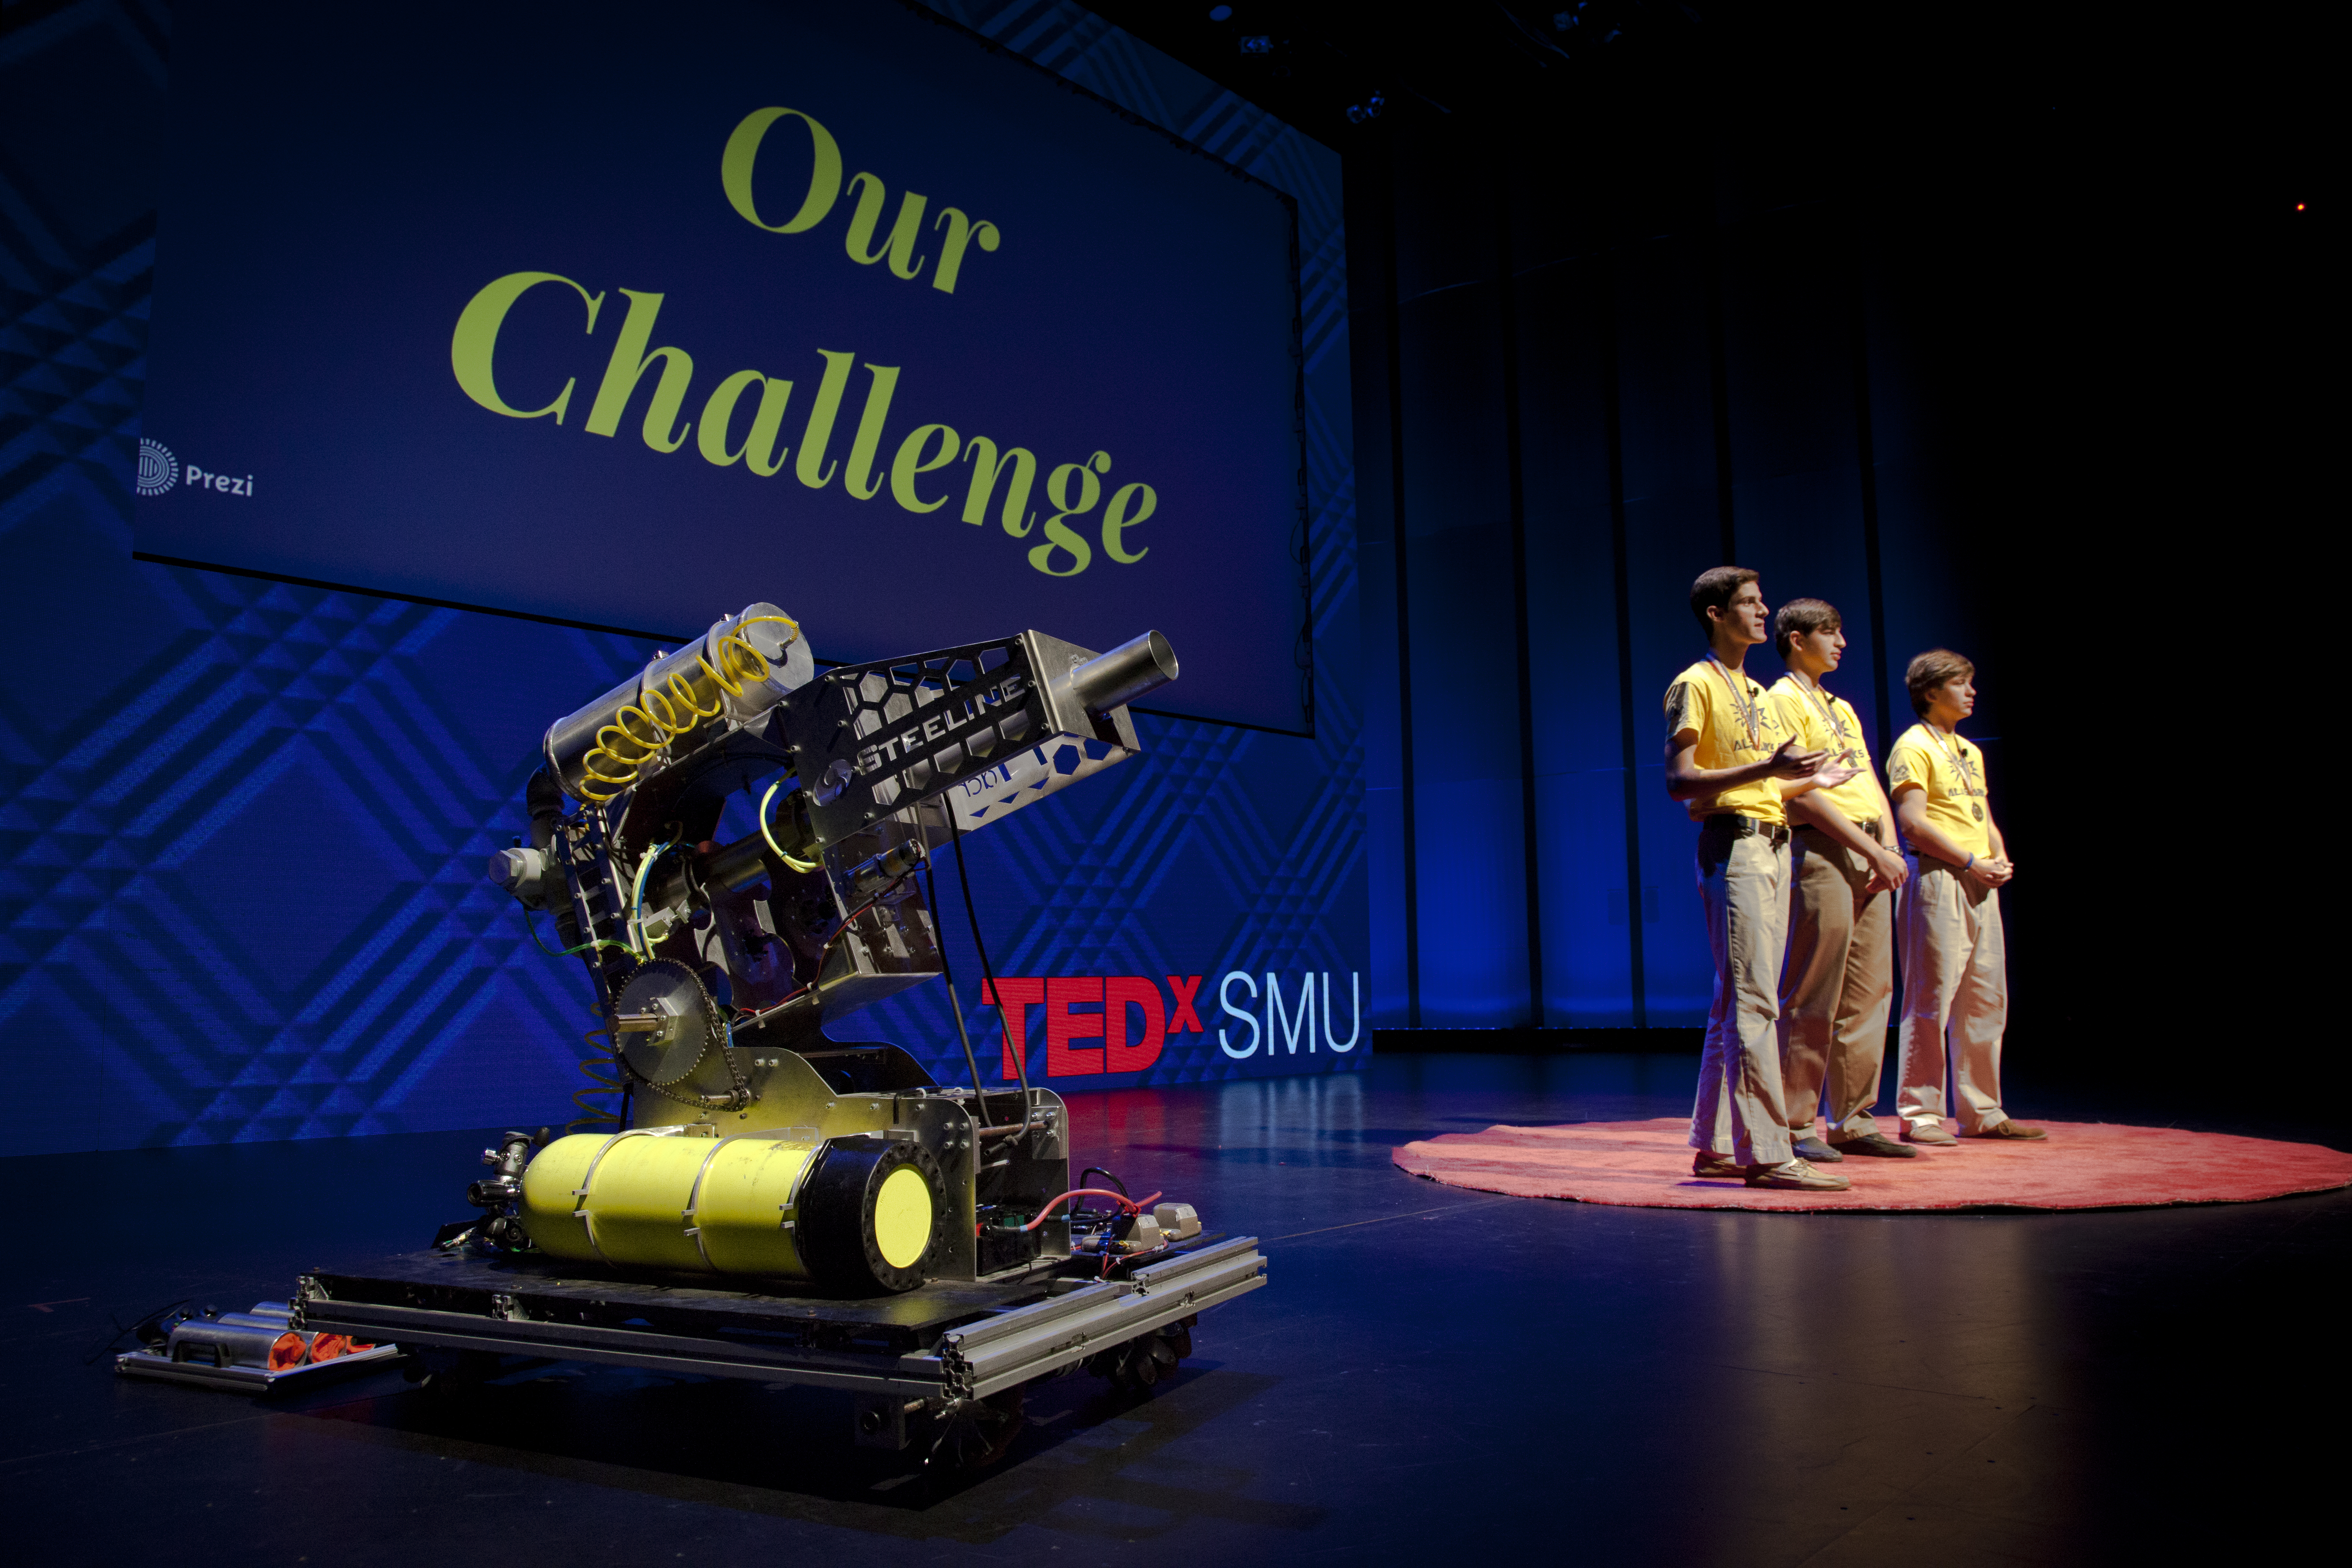 Image: TEDxSMU